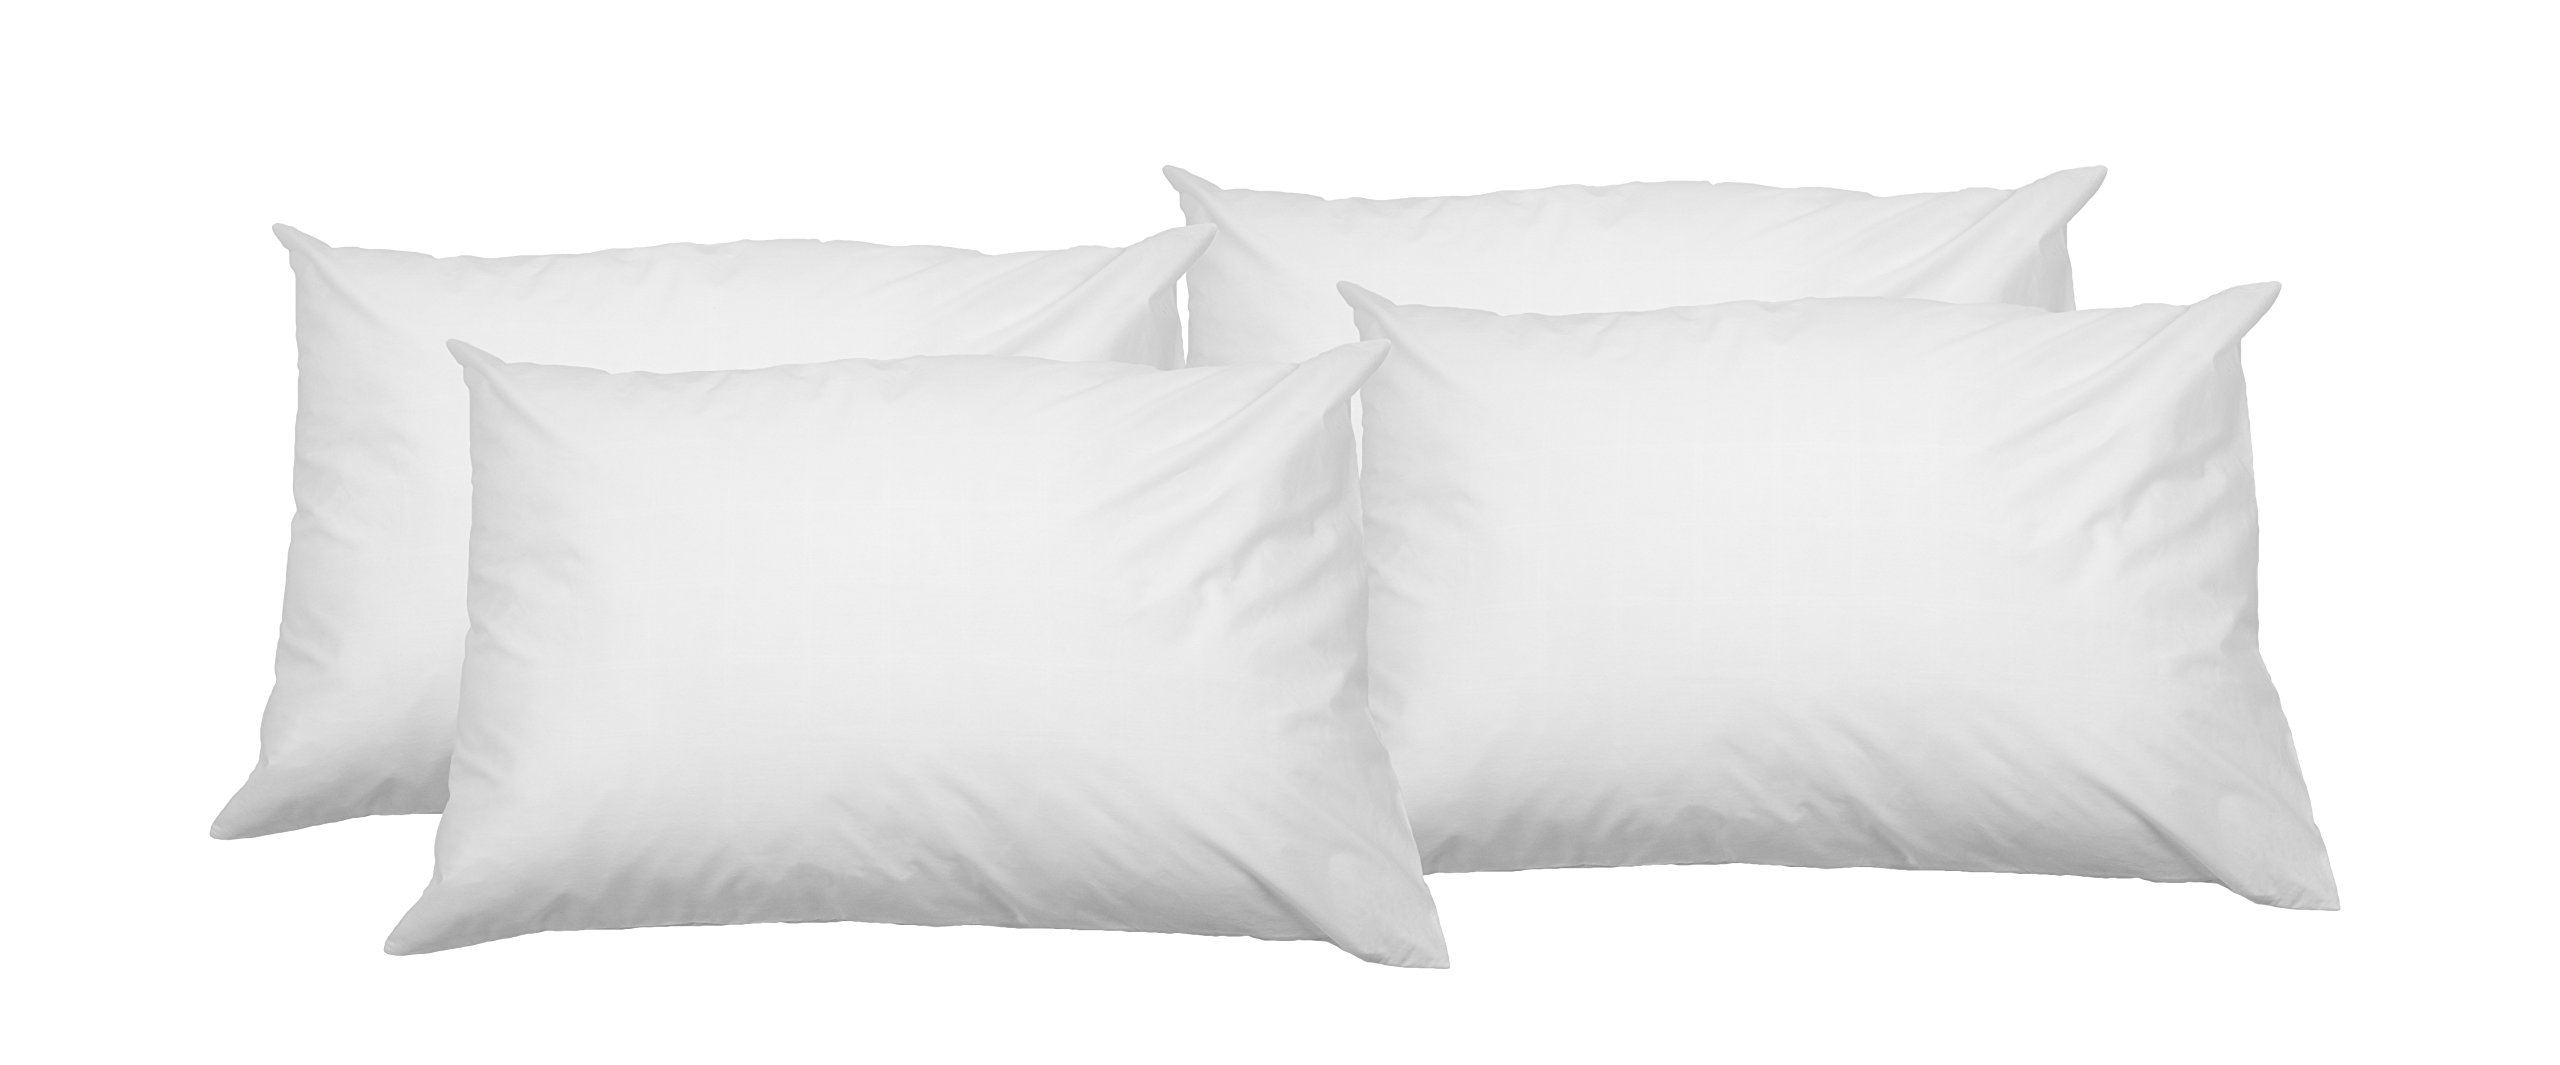 AmazonBasics - Funda de almohada suave con cremallera (100% algodón, 50 x 80